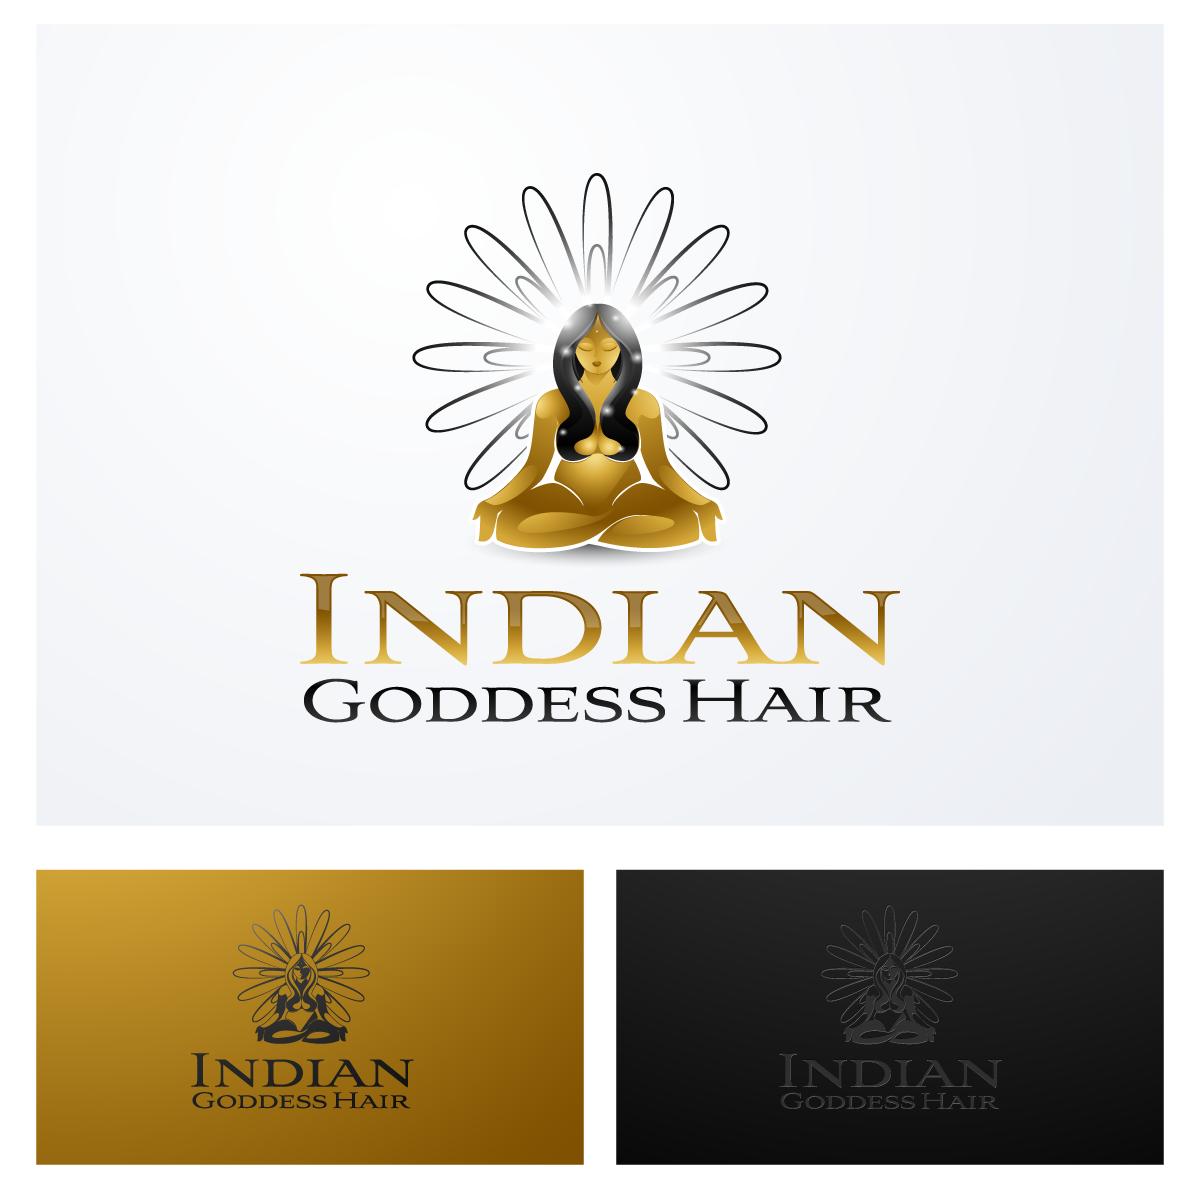 Logo Design by zesthar - Entry No. 15 in the Logo Design Contest Indian Goddess Hair LOGO DESIGN.